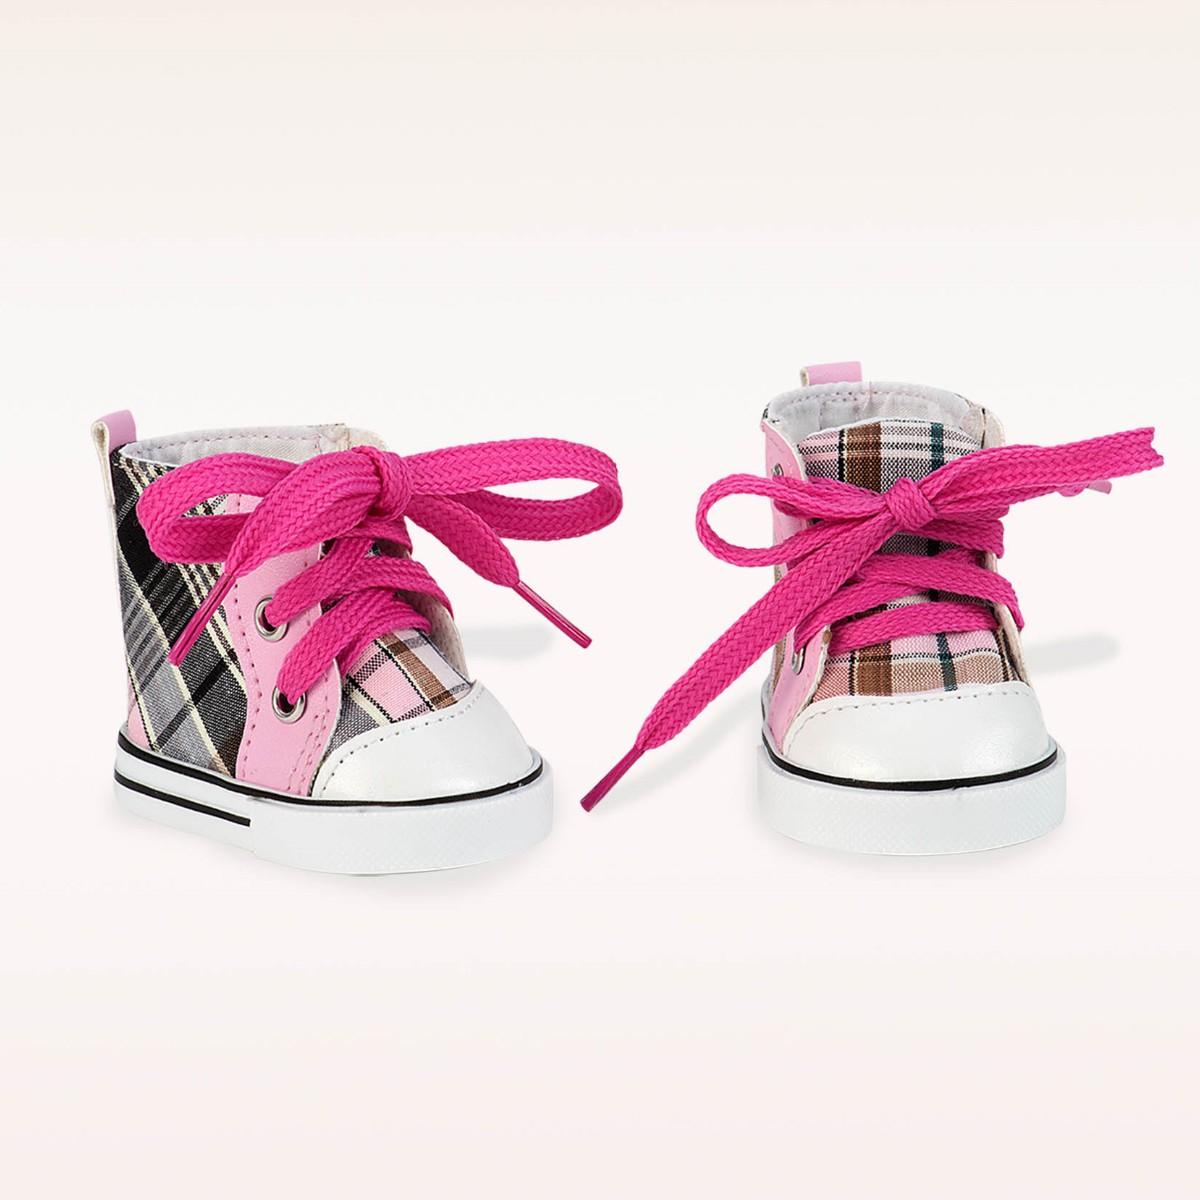 Our Generation dukkesko, sneakers